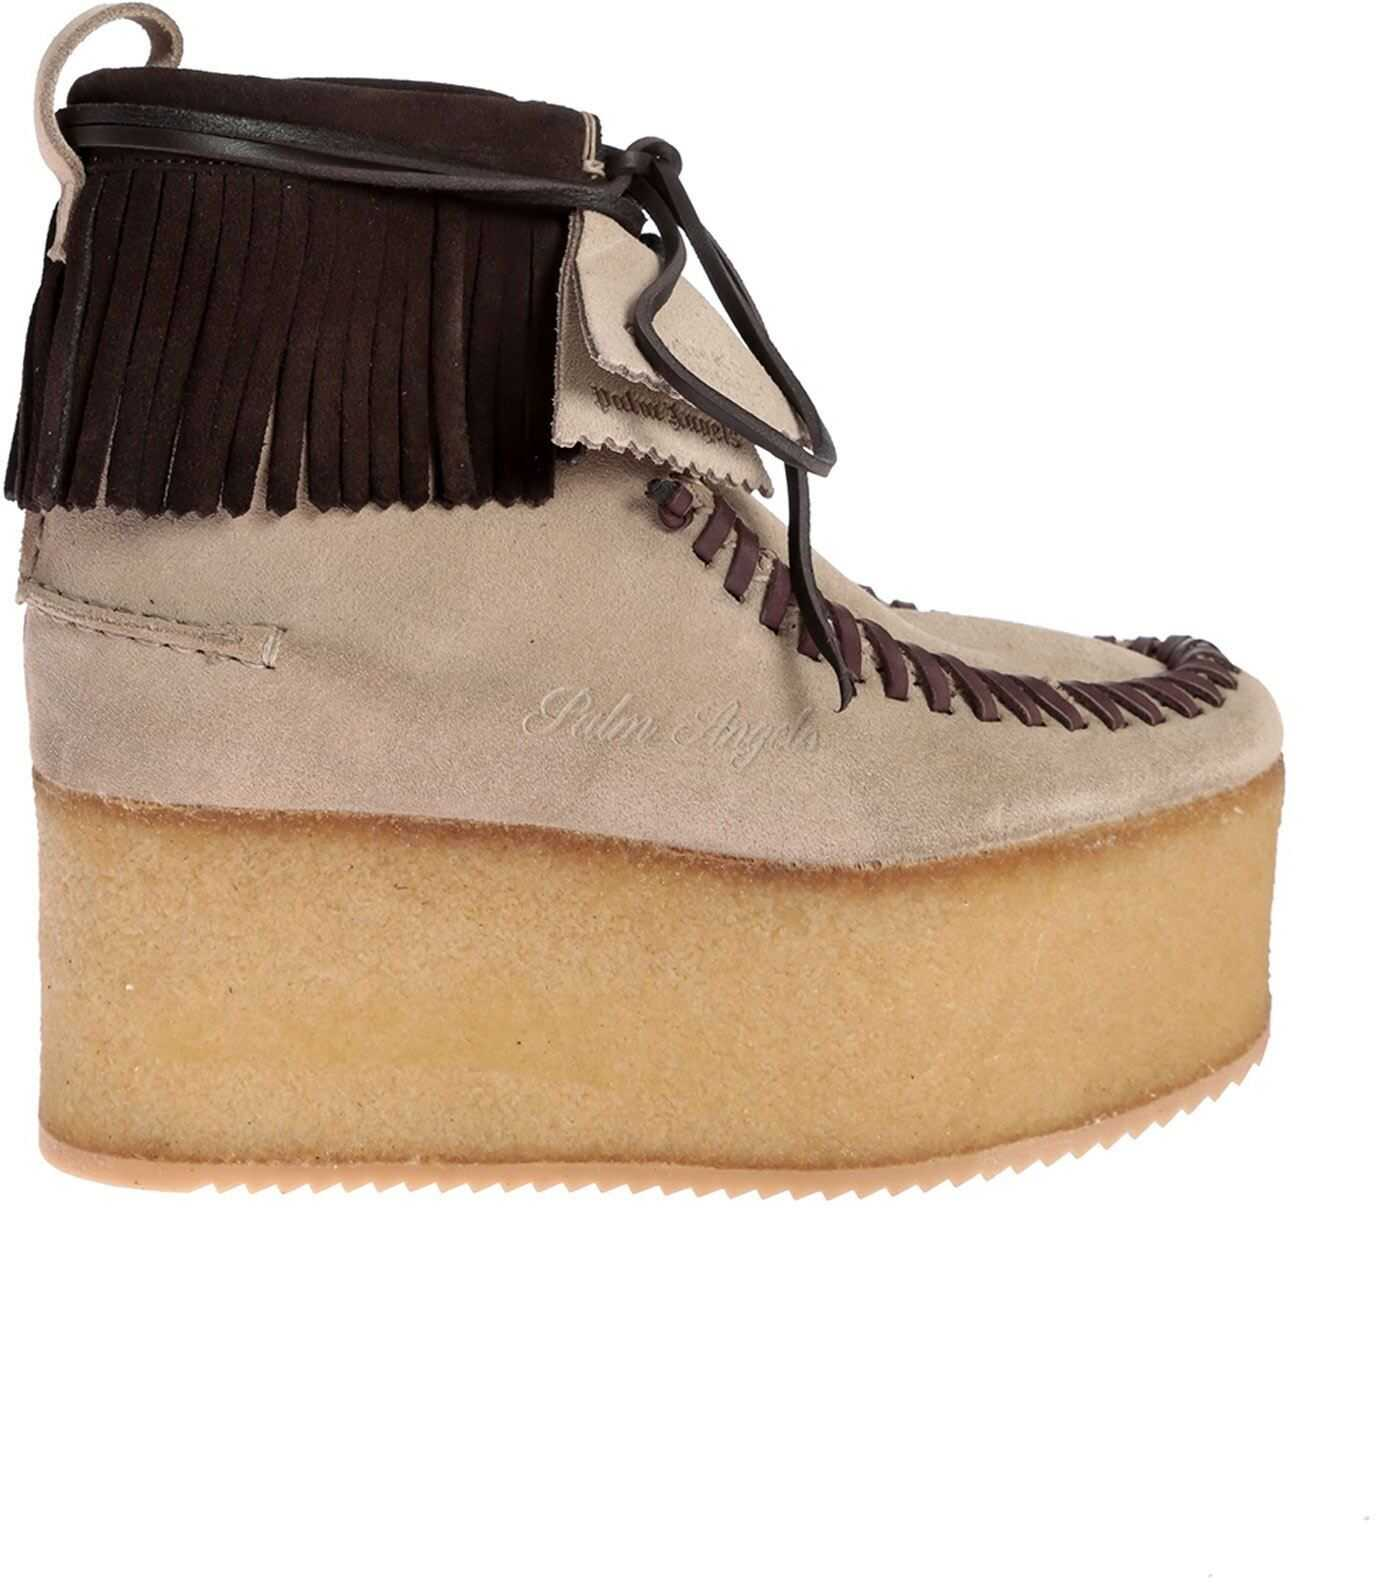 Wallabee Clarks Ankle Boots In Beige